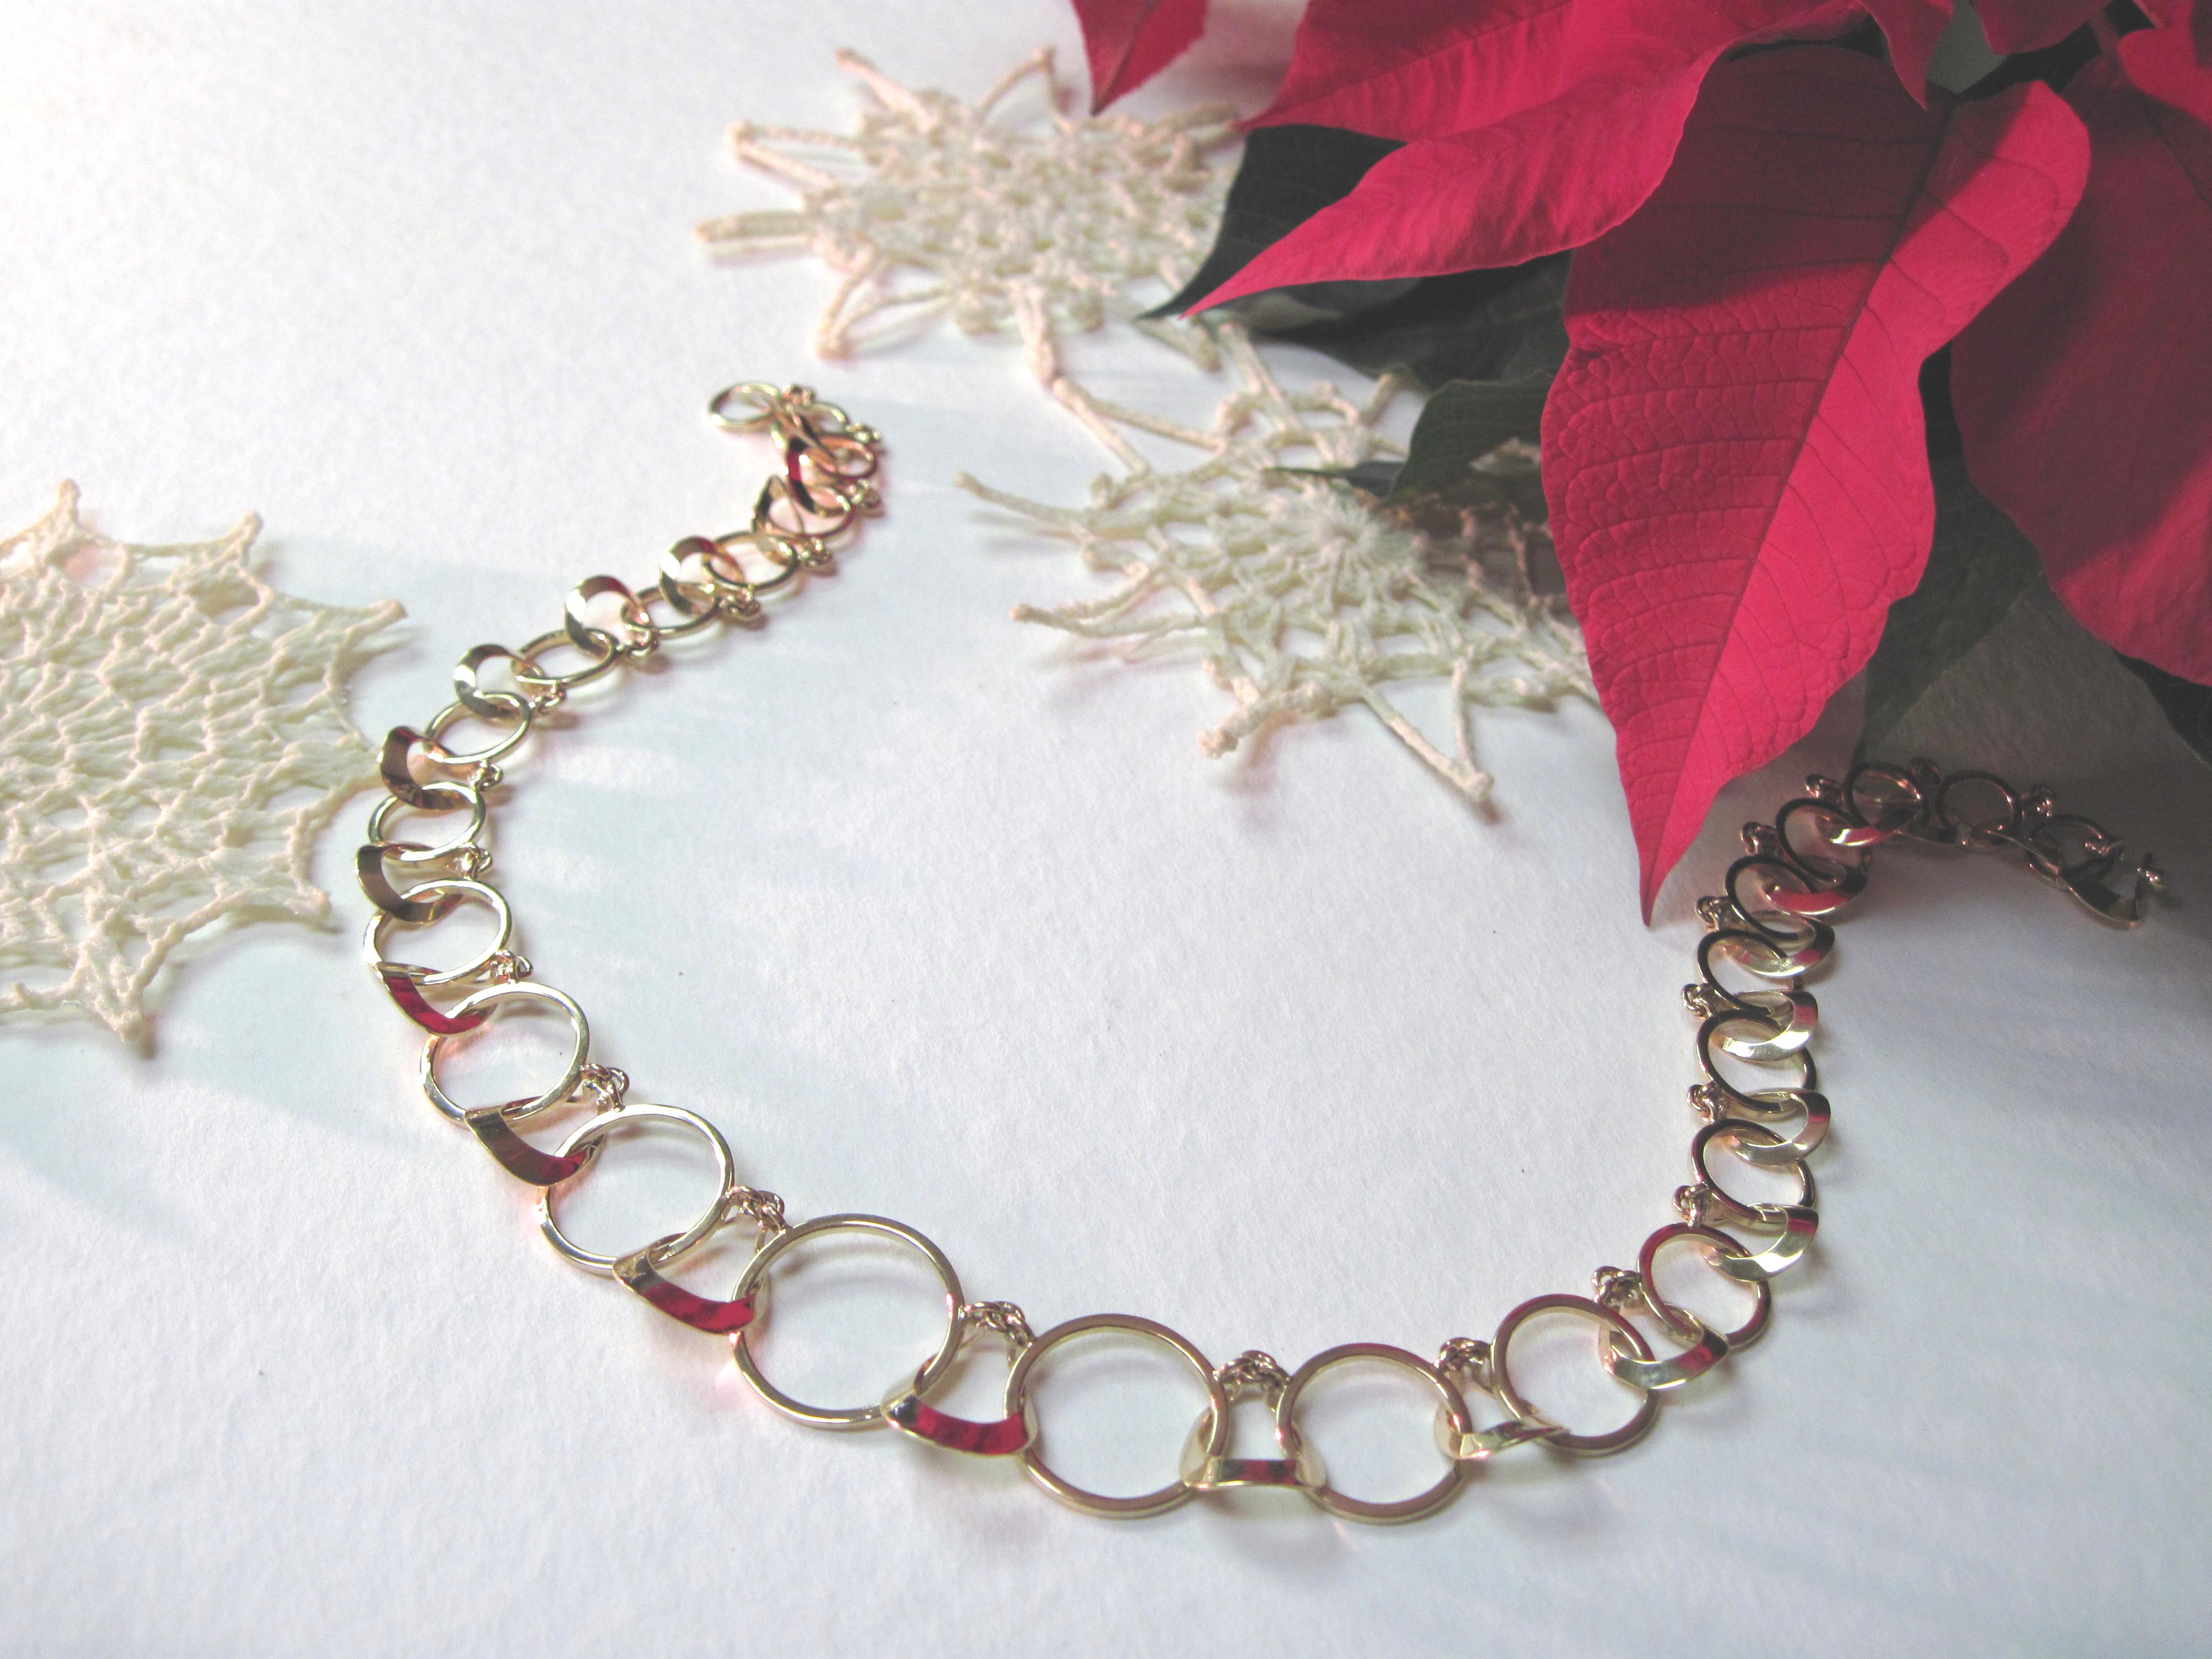 Tailored Jewelry